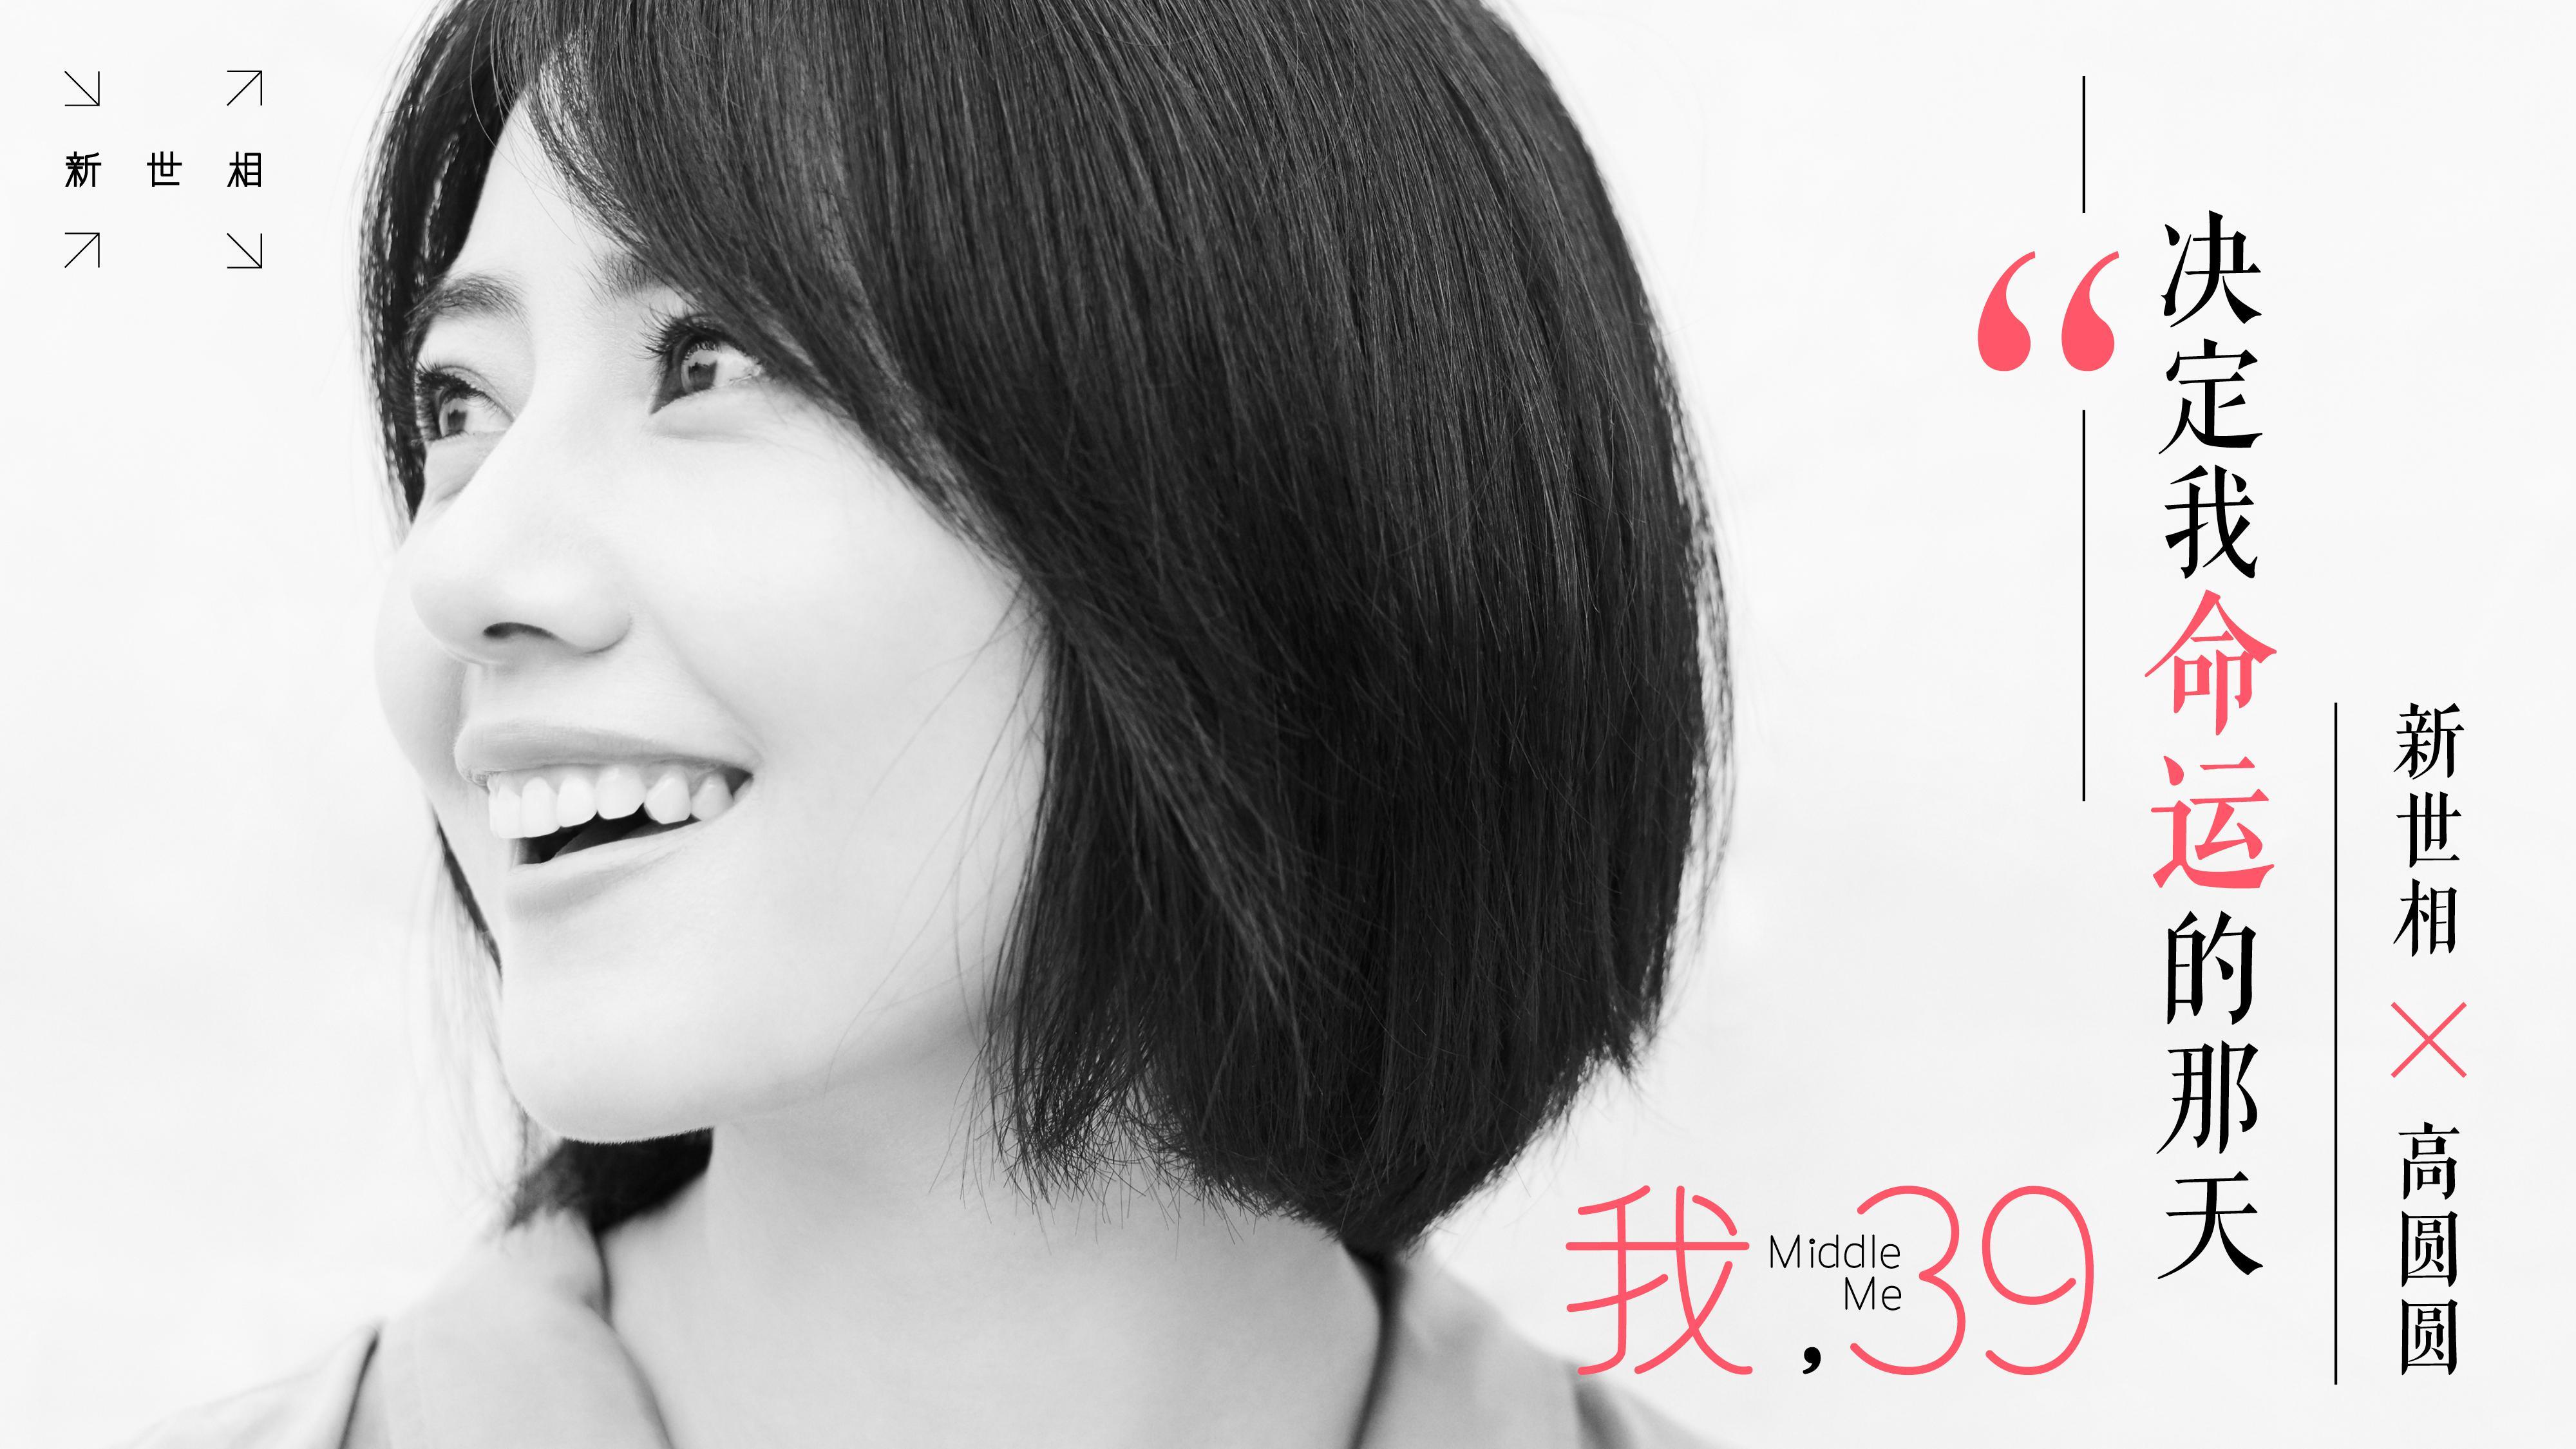 http://www.qwican.com/yuleshishang/2164284.html